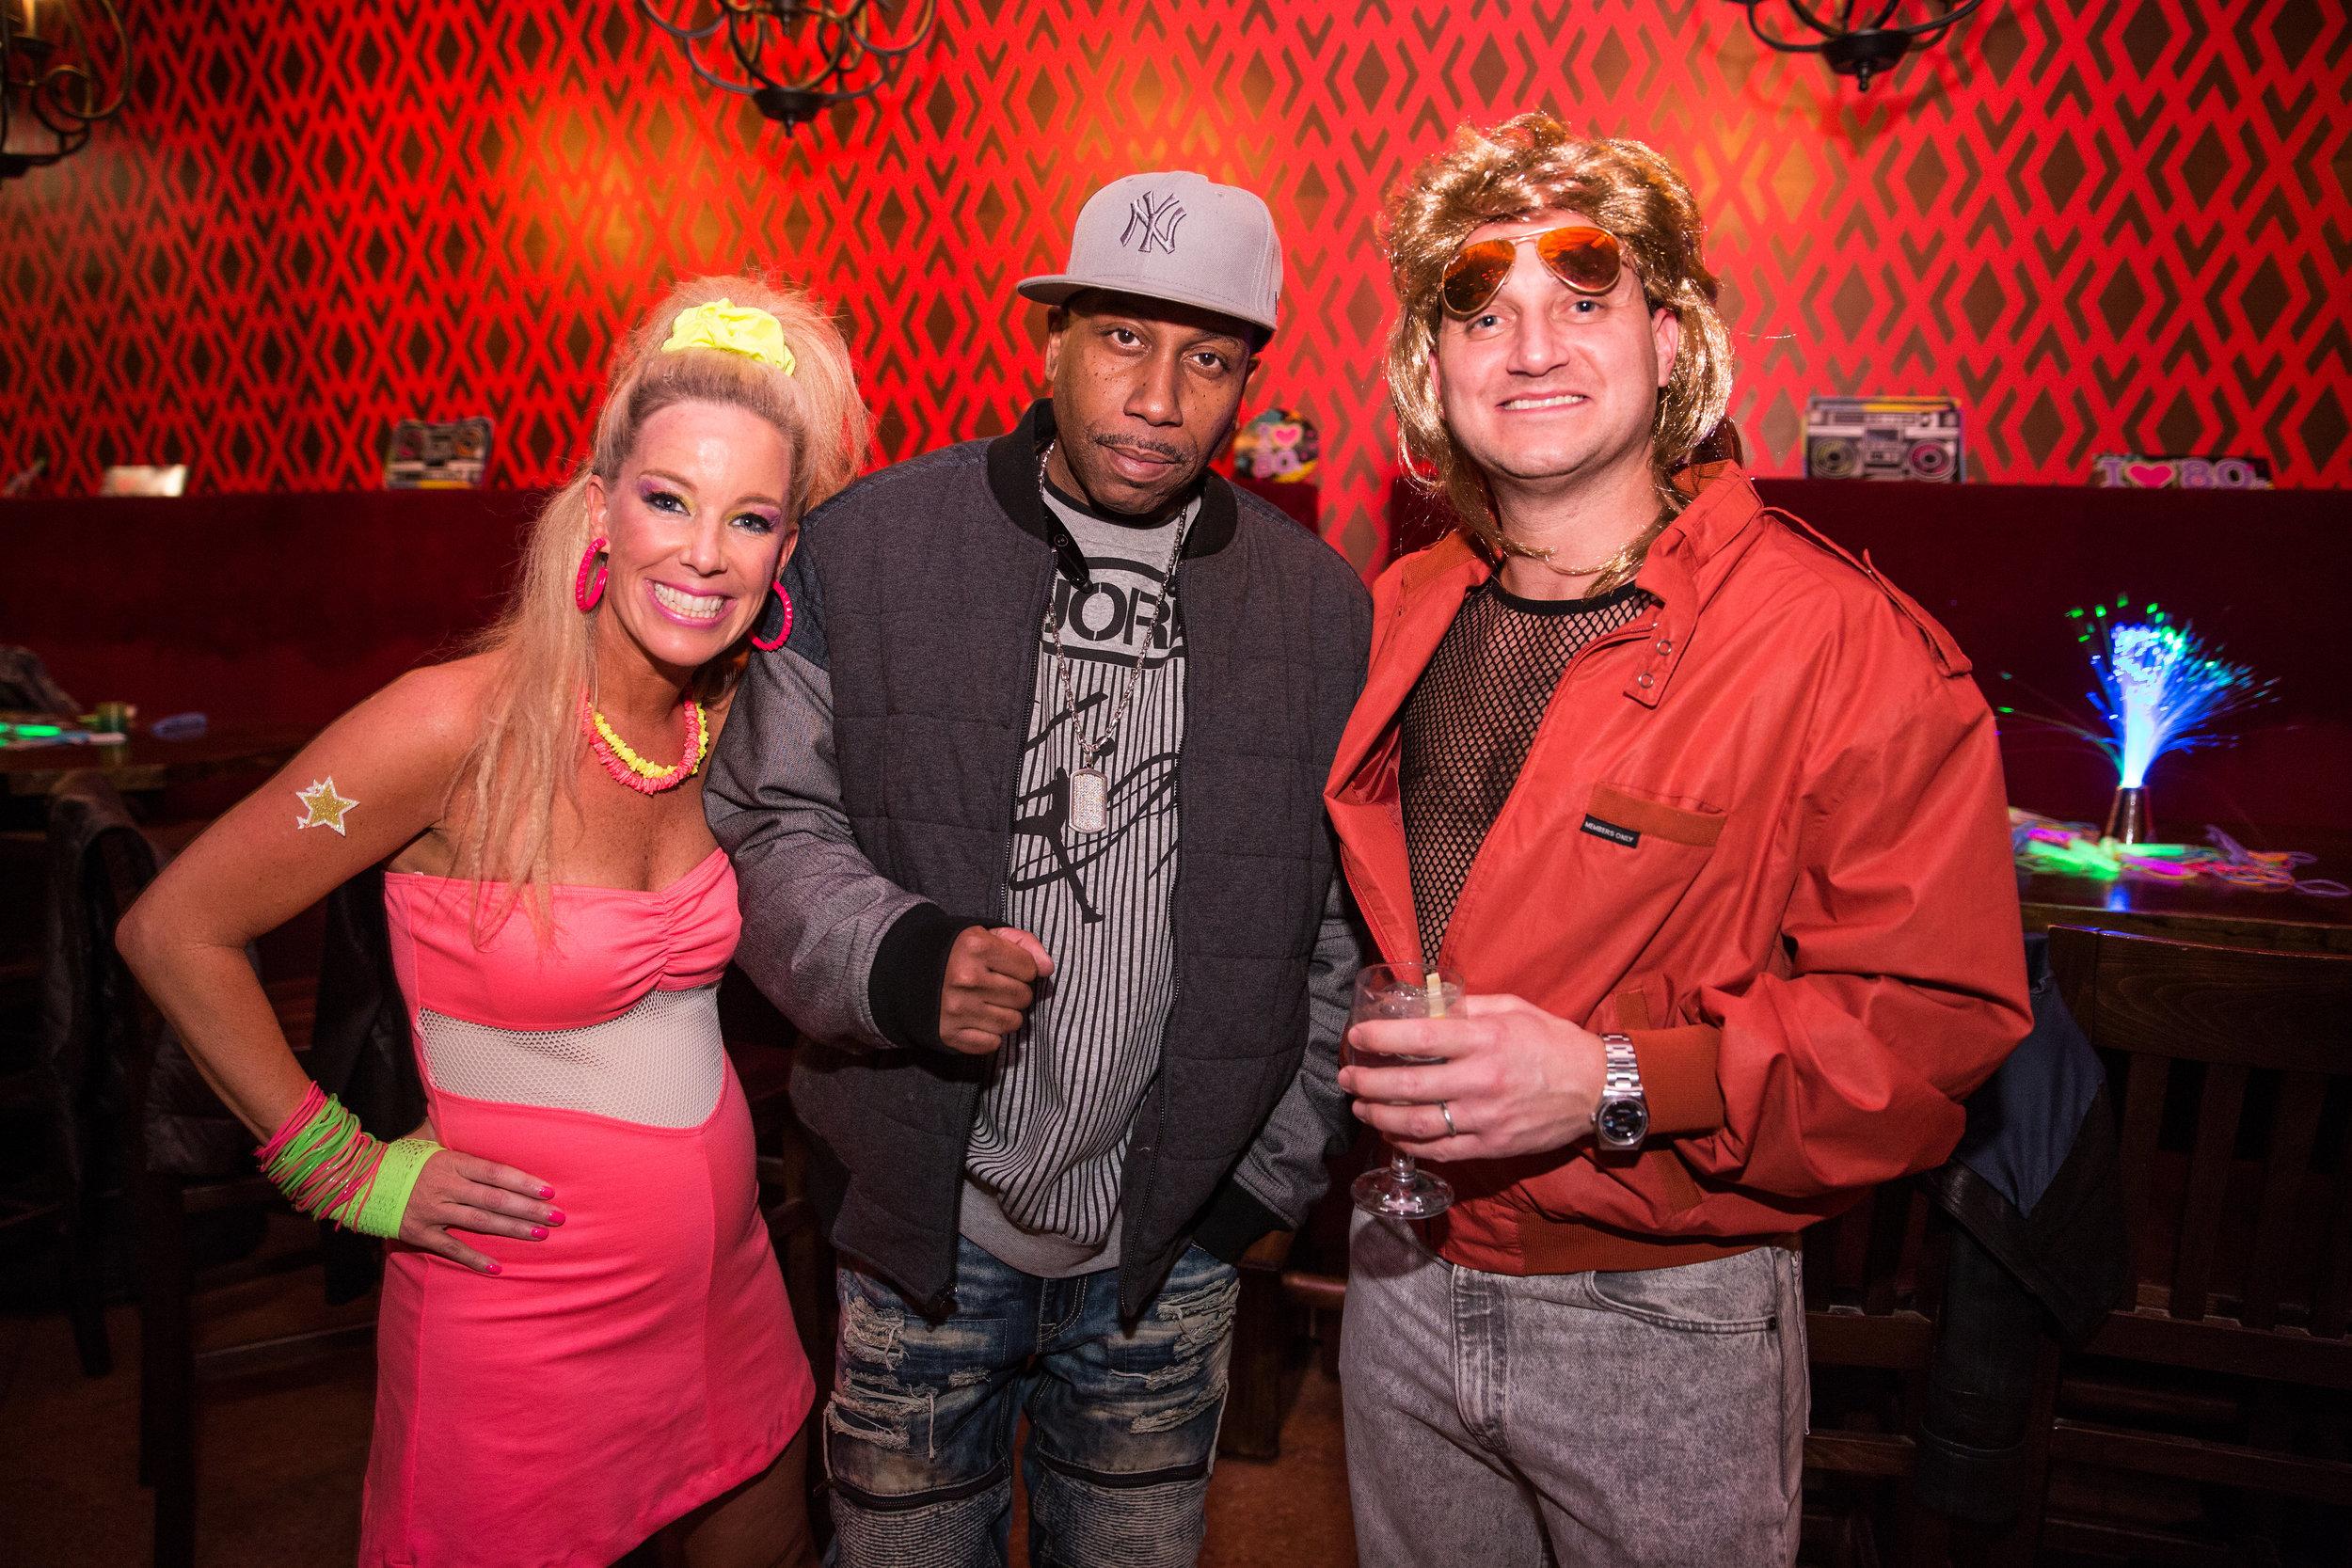 JJ-Ignotz-NYC-Photographer-parties_012.JPG